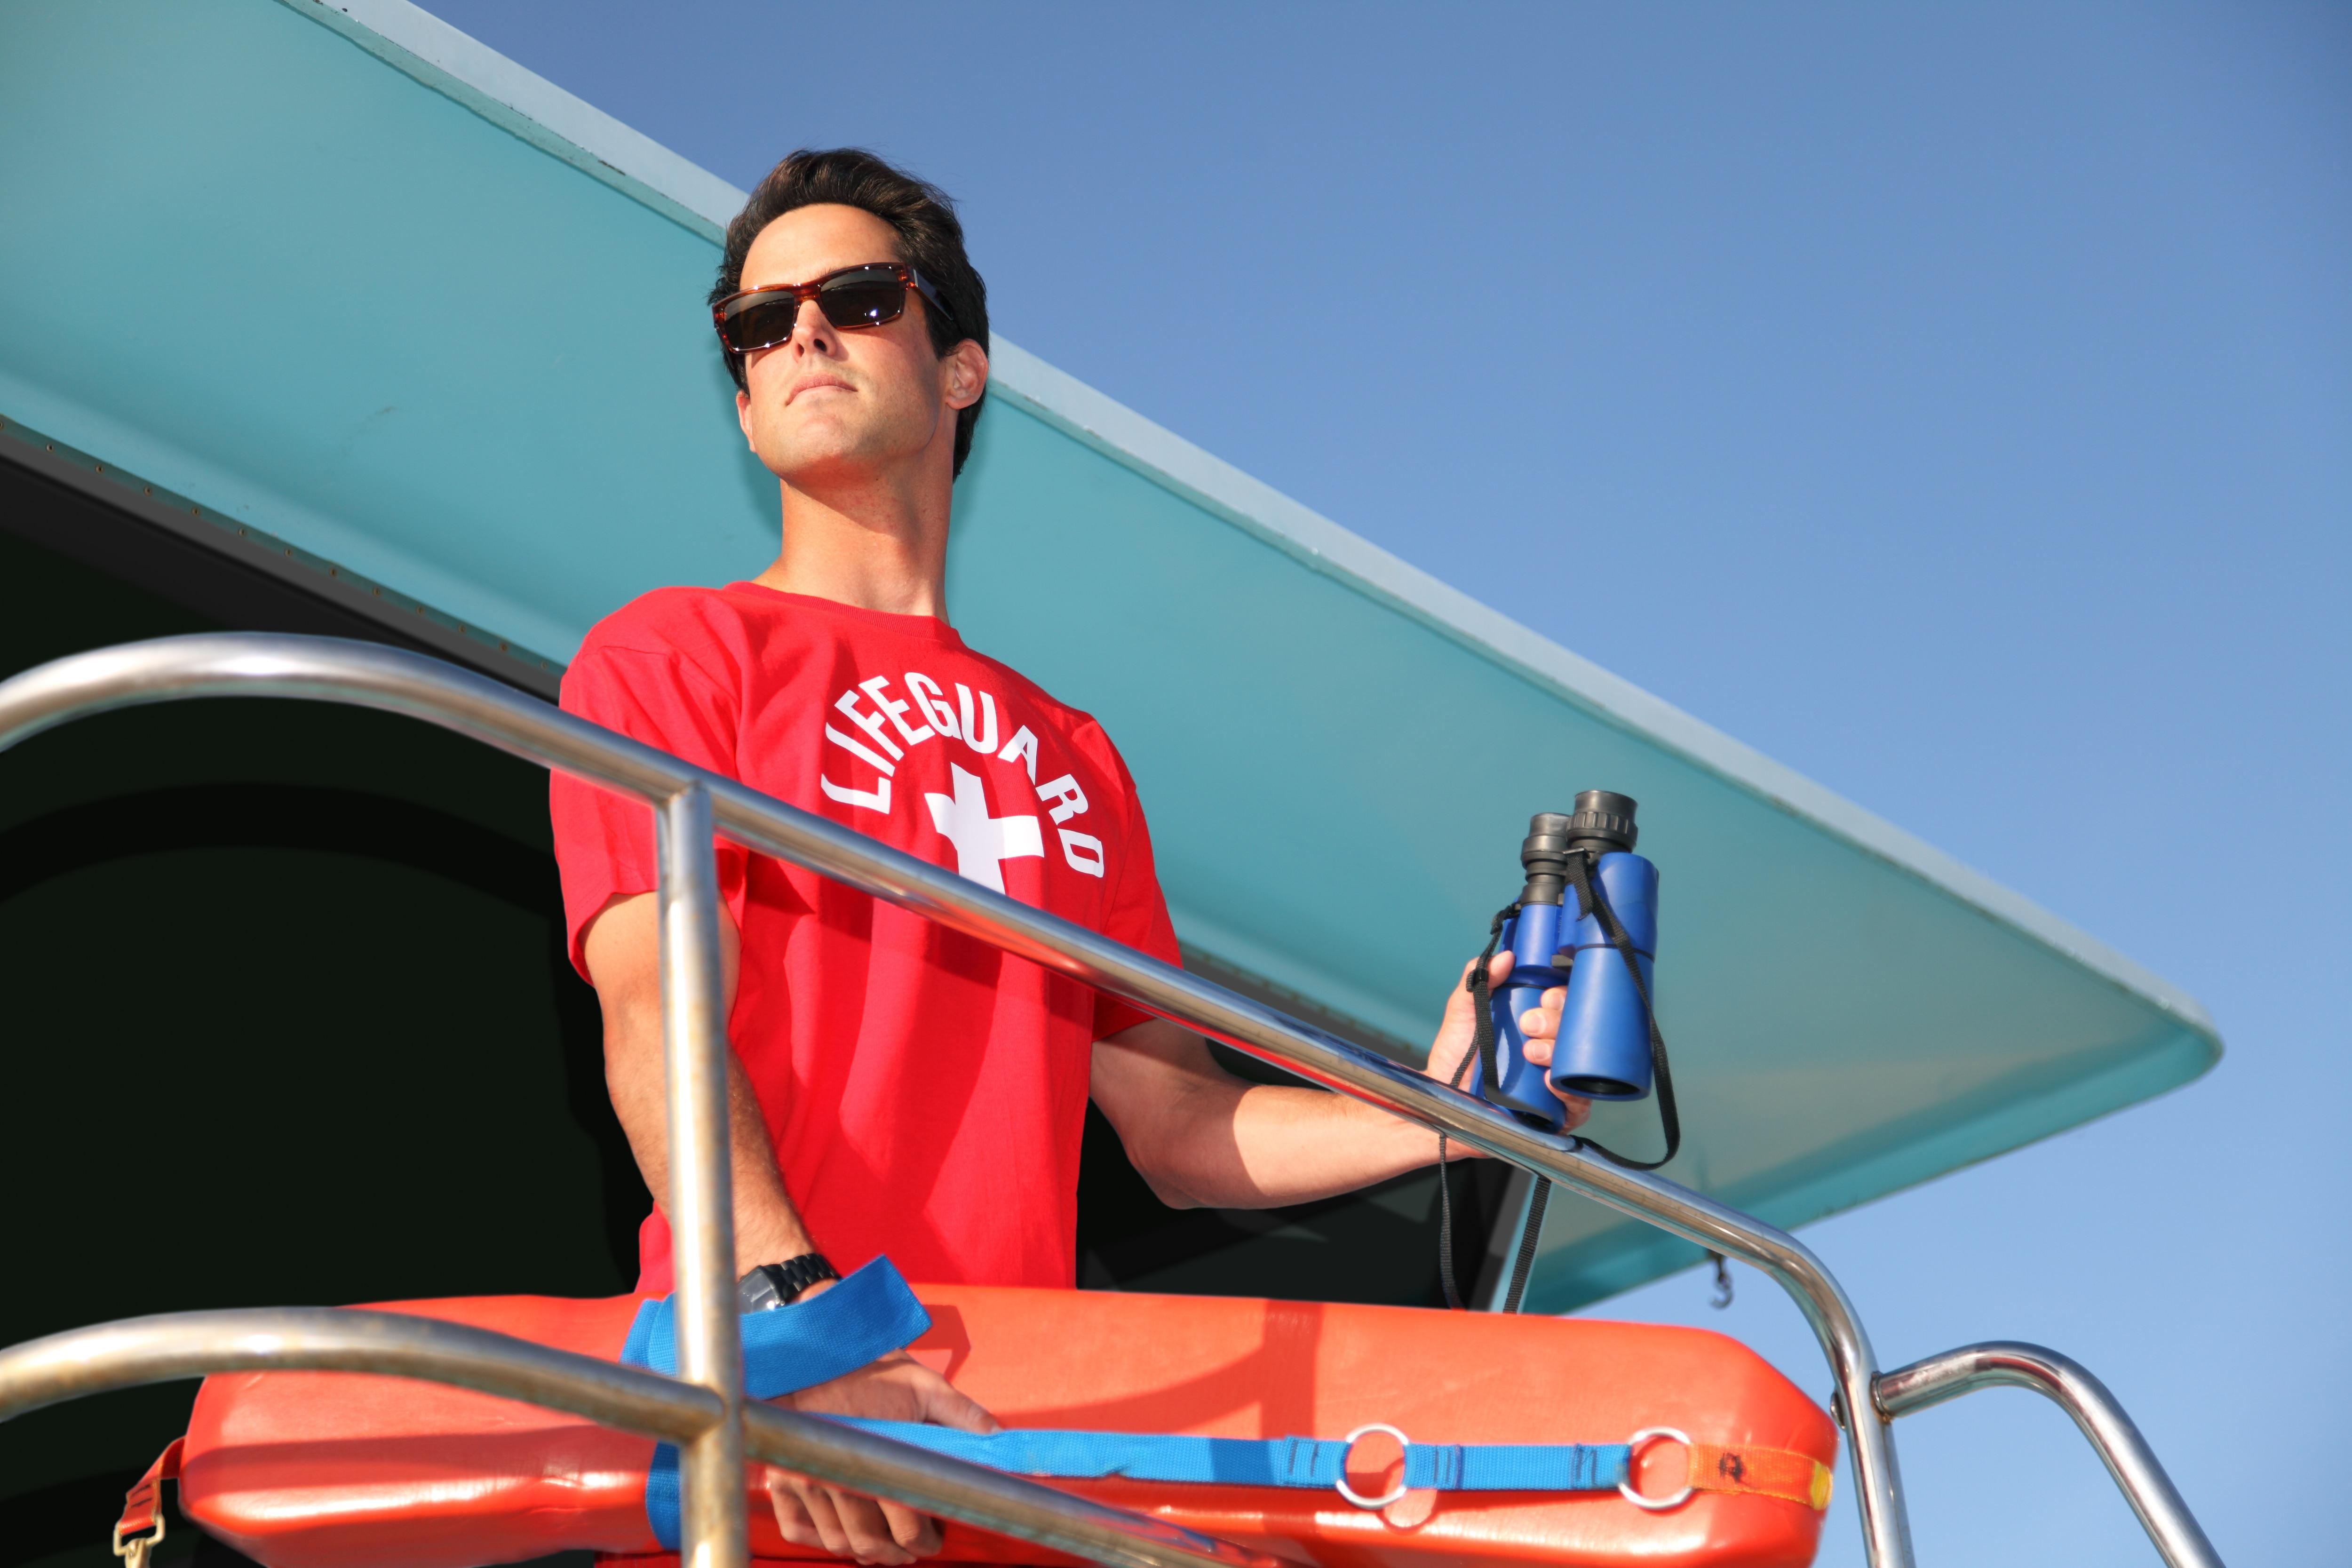 Beach Lifeguard On Tower